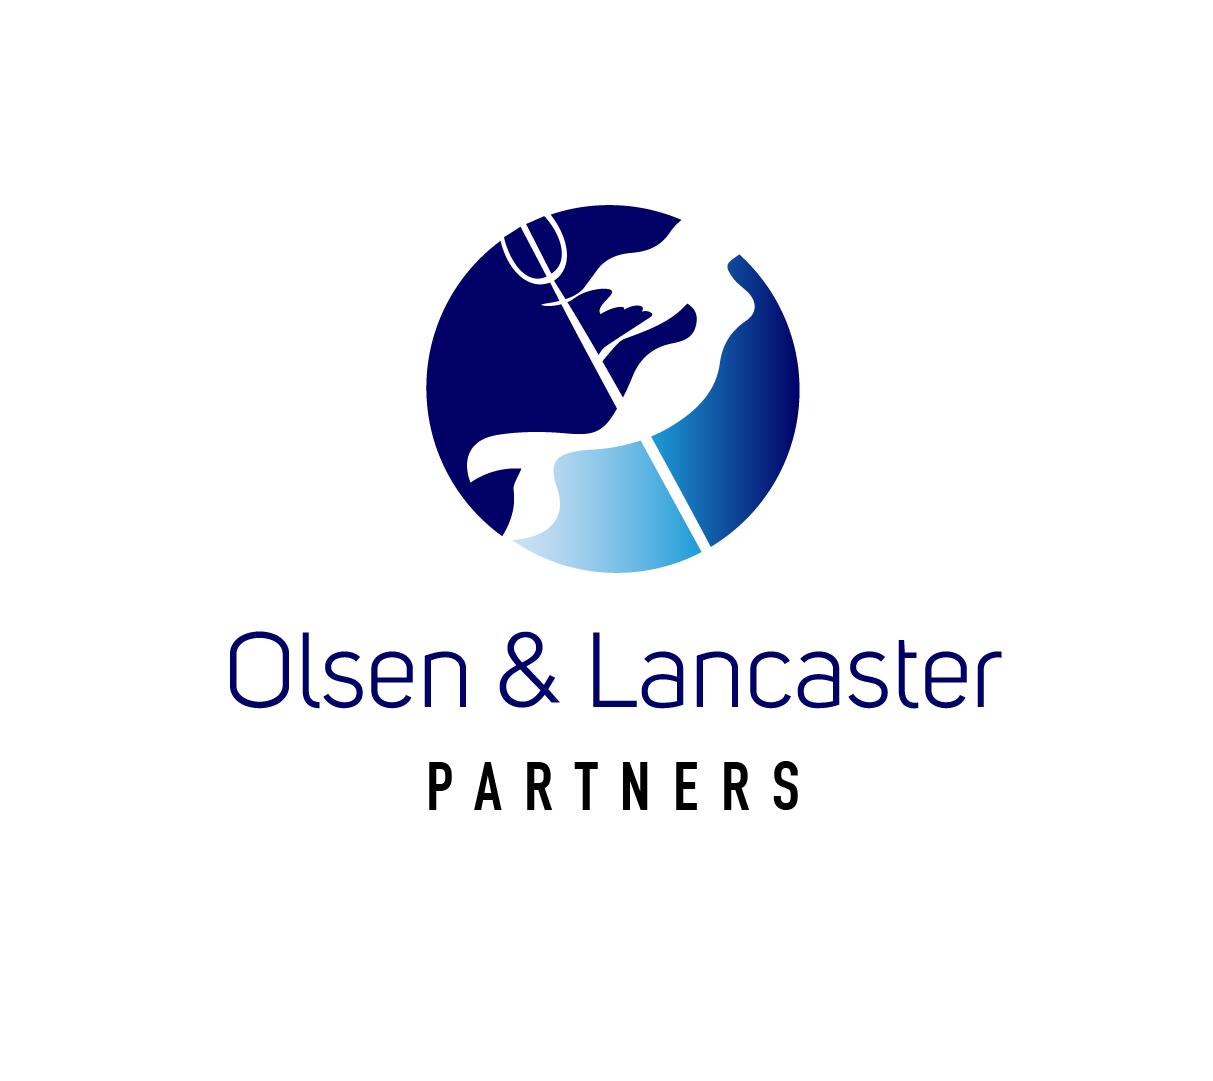 Olsen & Lancaster Partners e PMCG Sociedade de Advogados unem esforços no mercado ibérico.